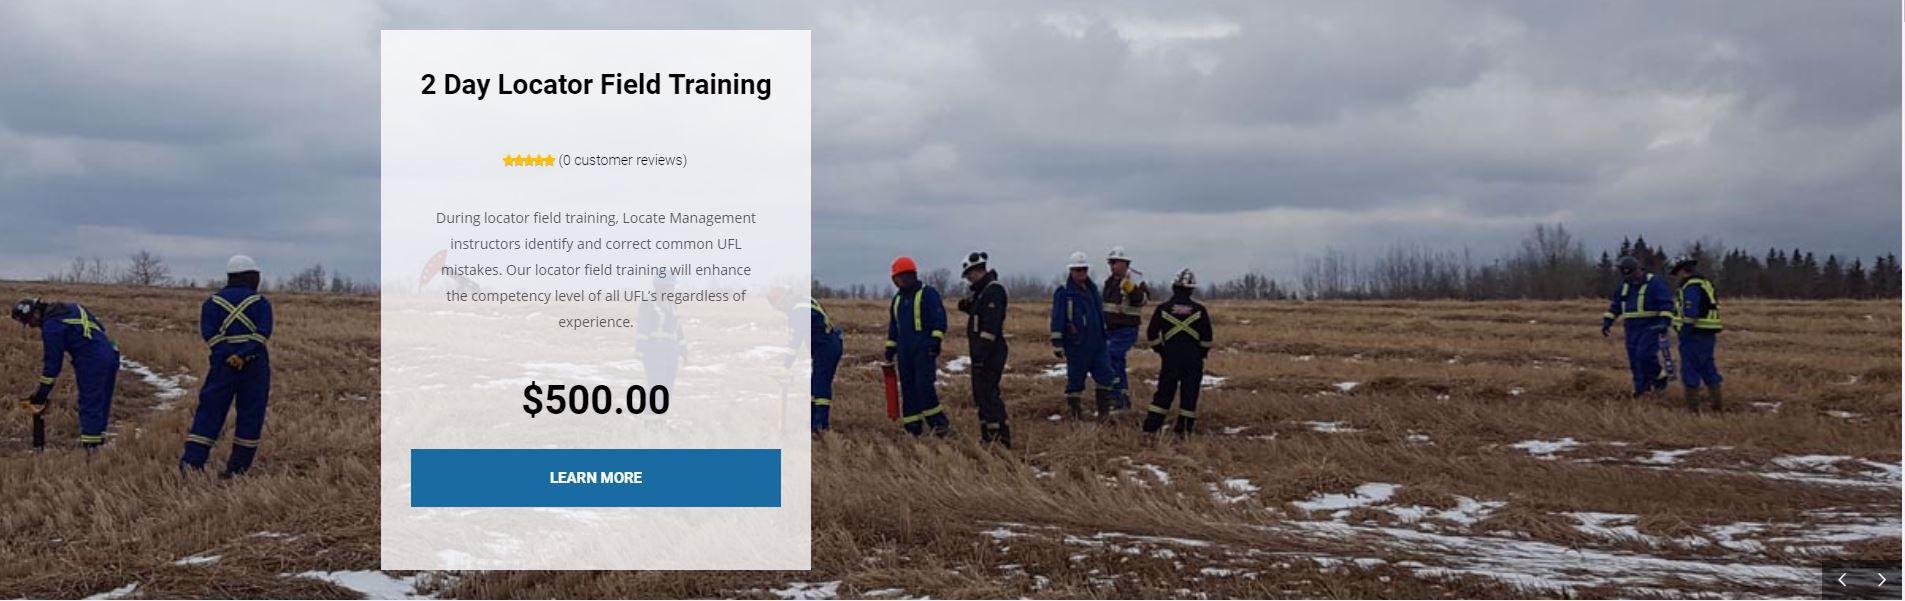 2 Day Locator Field Training